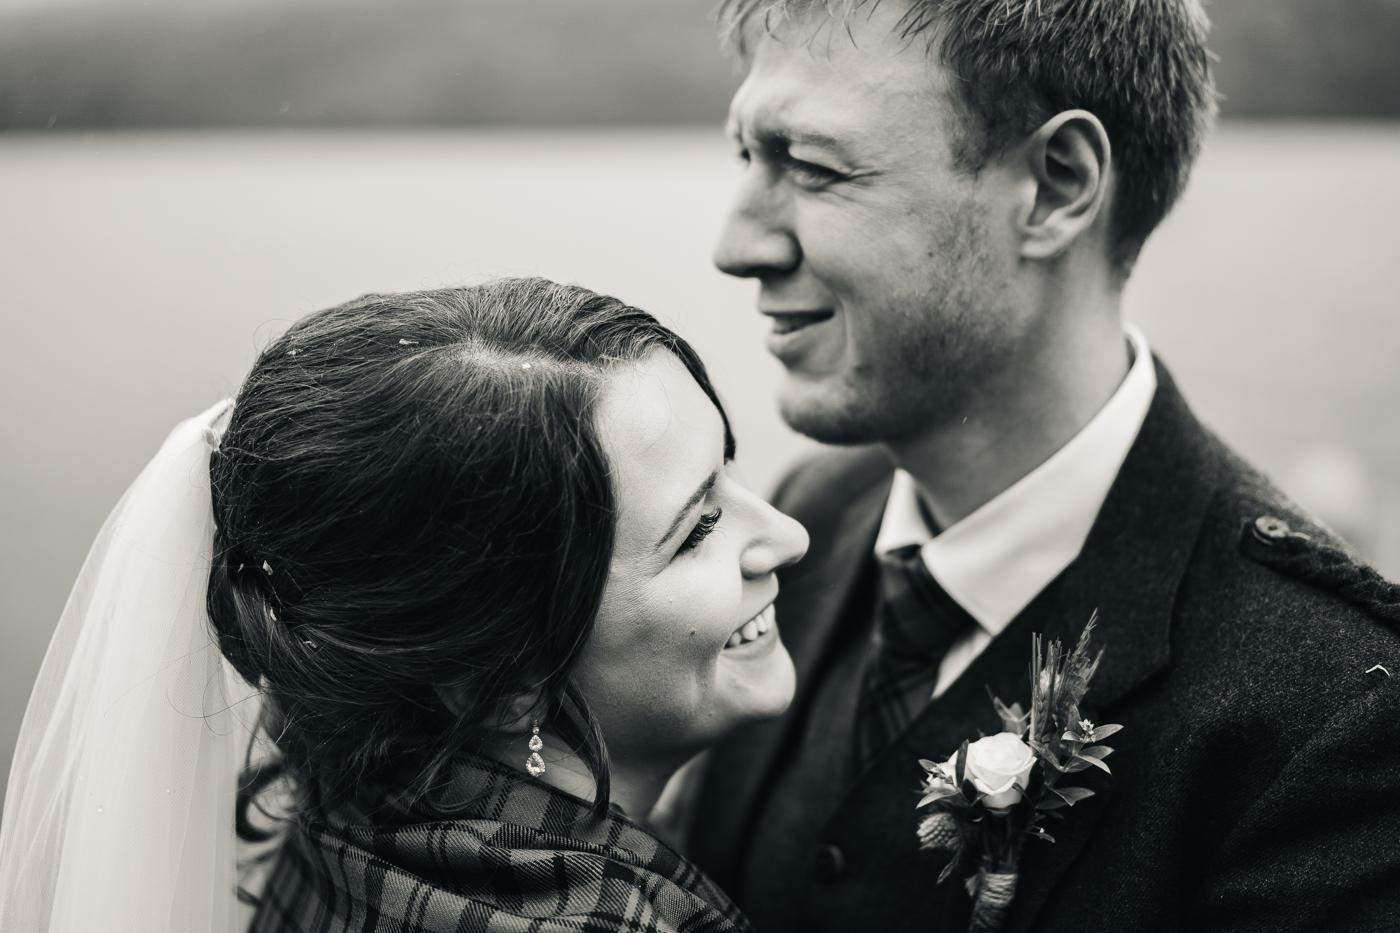 scottish-wedding-trossachs-loch-tay-highlannds-relaxed-photography-photographer-0038.jpg